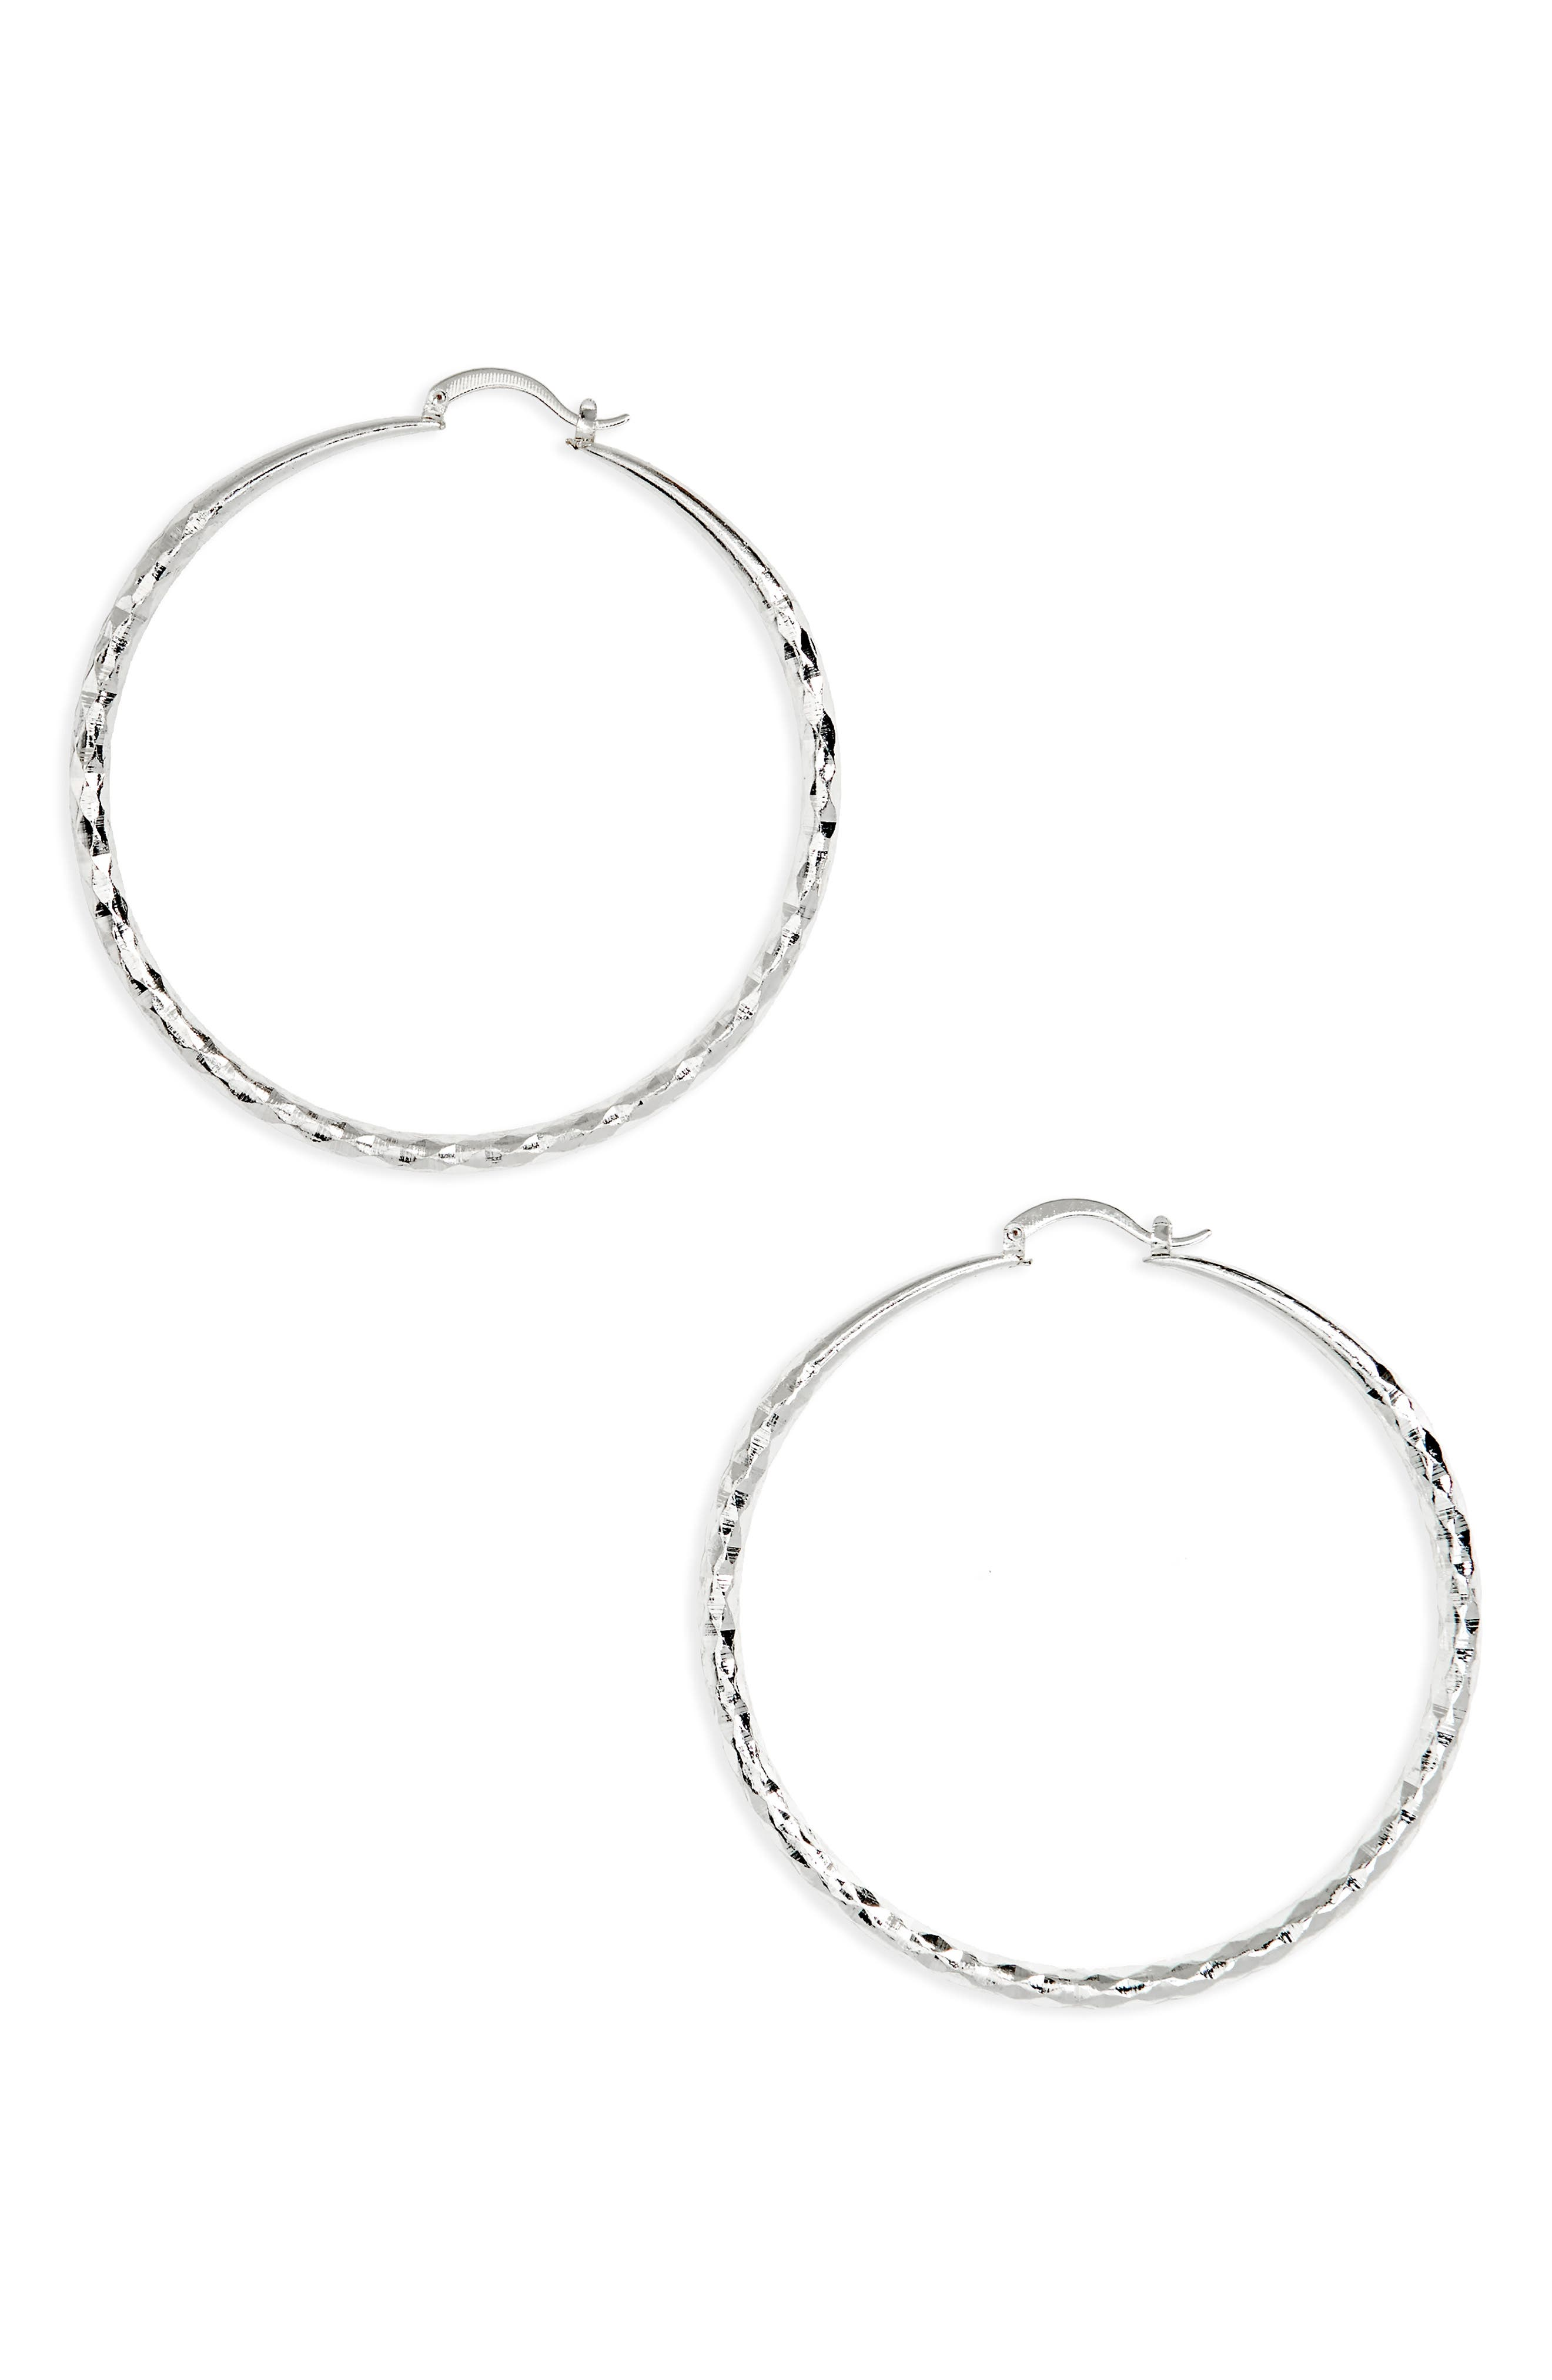 Oversized Textured Hoop Earrings,                             Main thumbnail 1, color,                             040